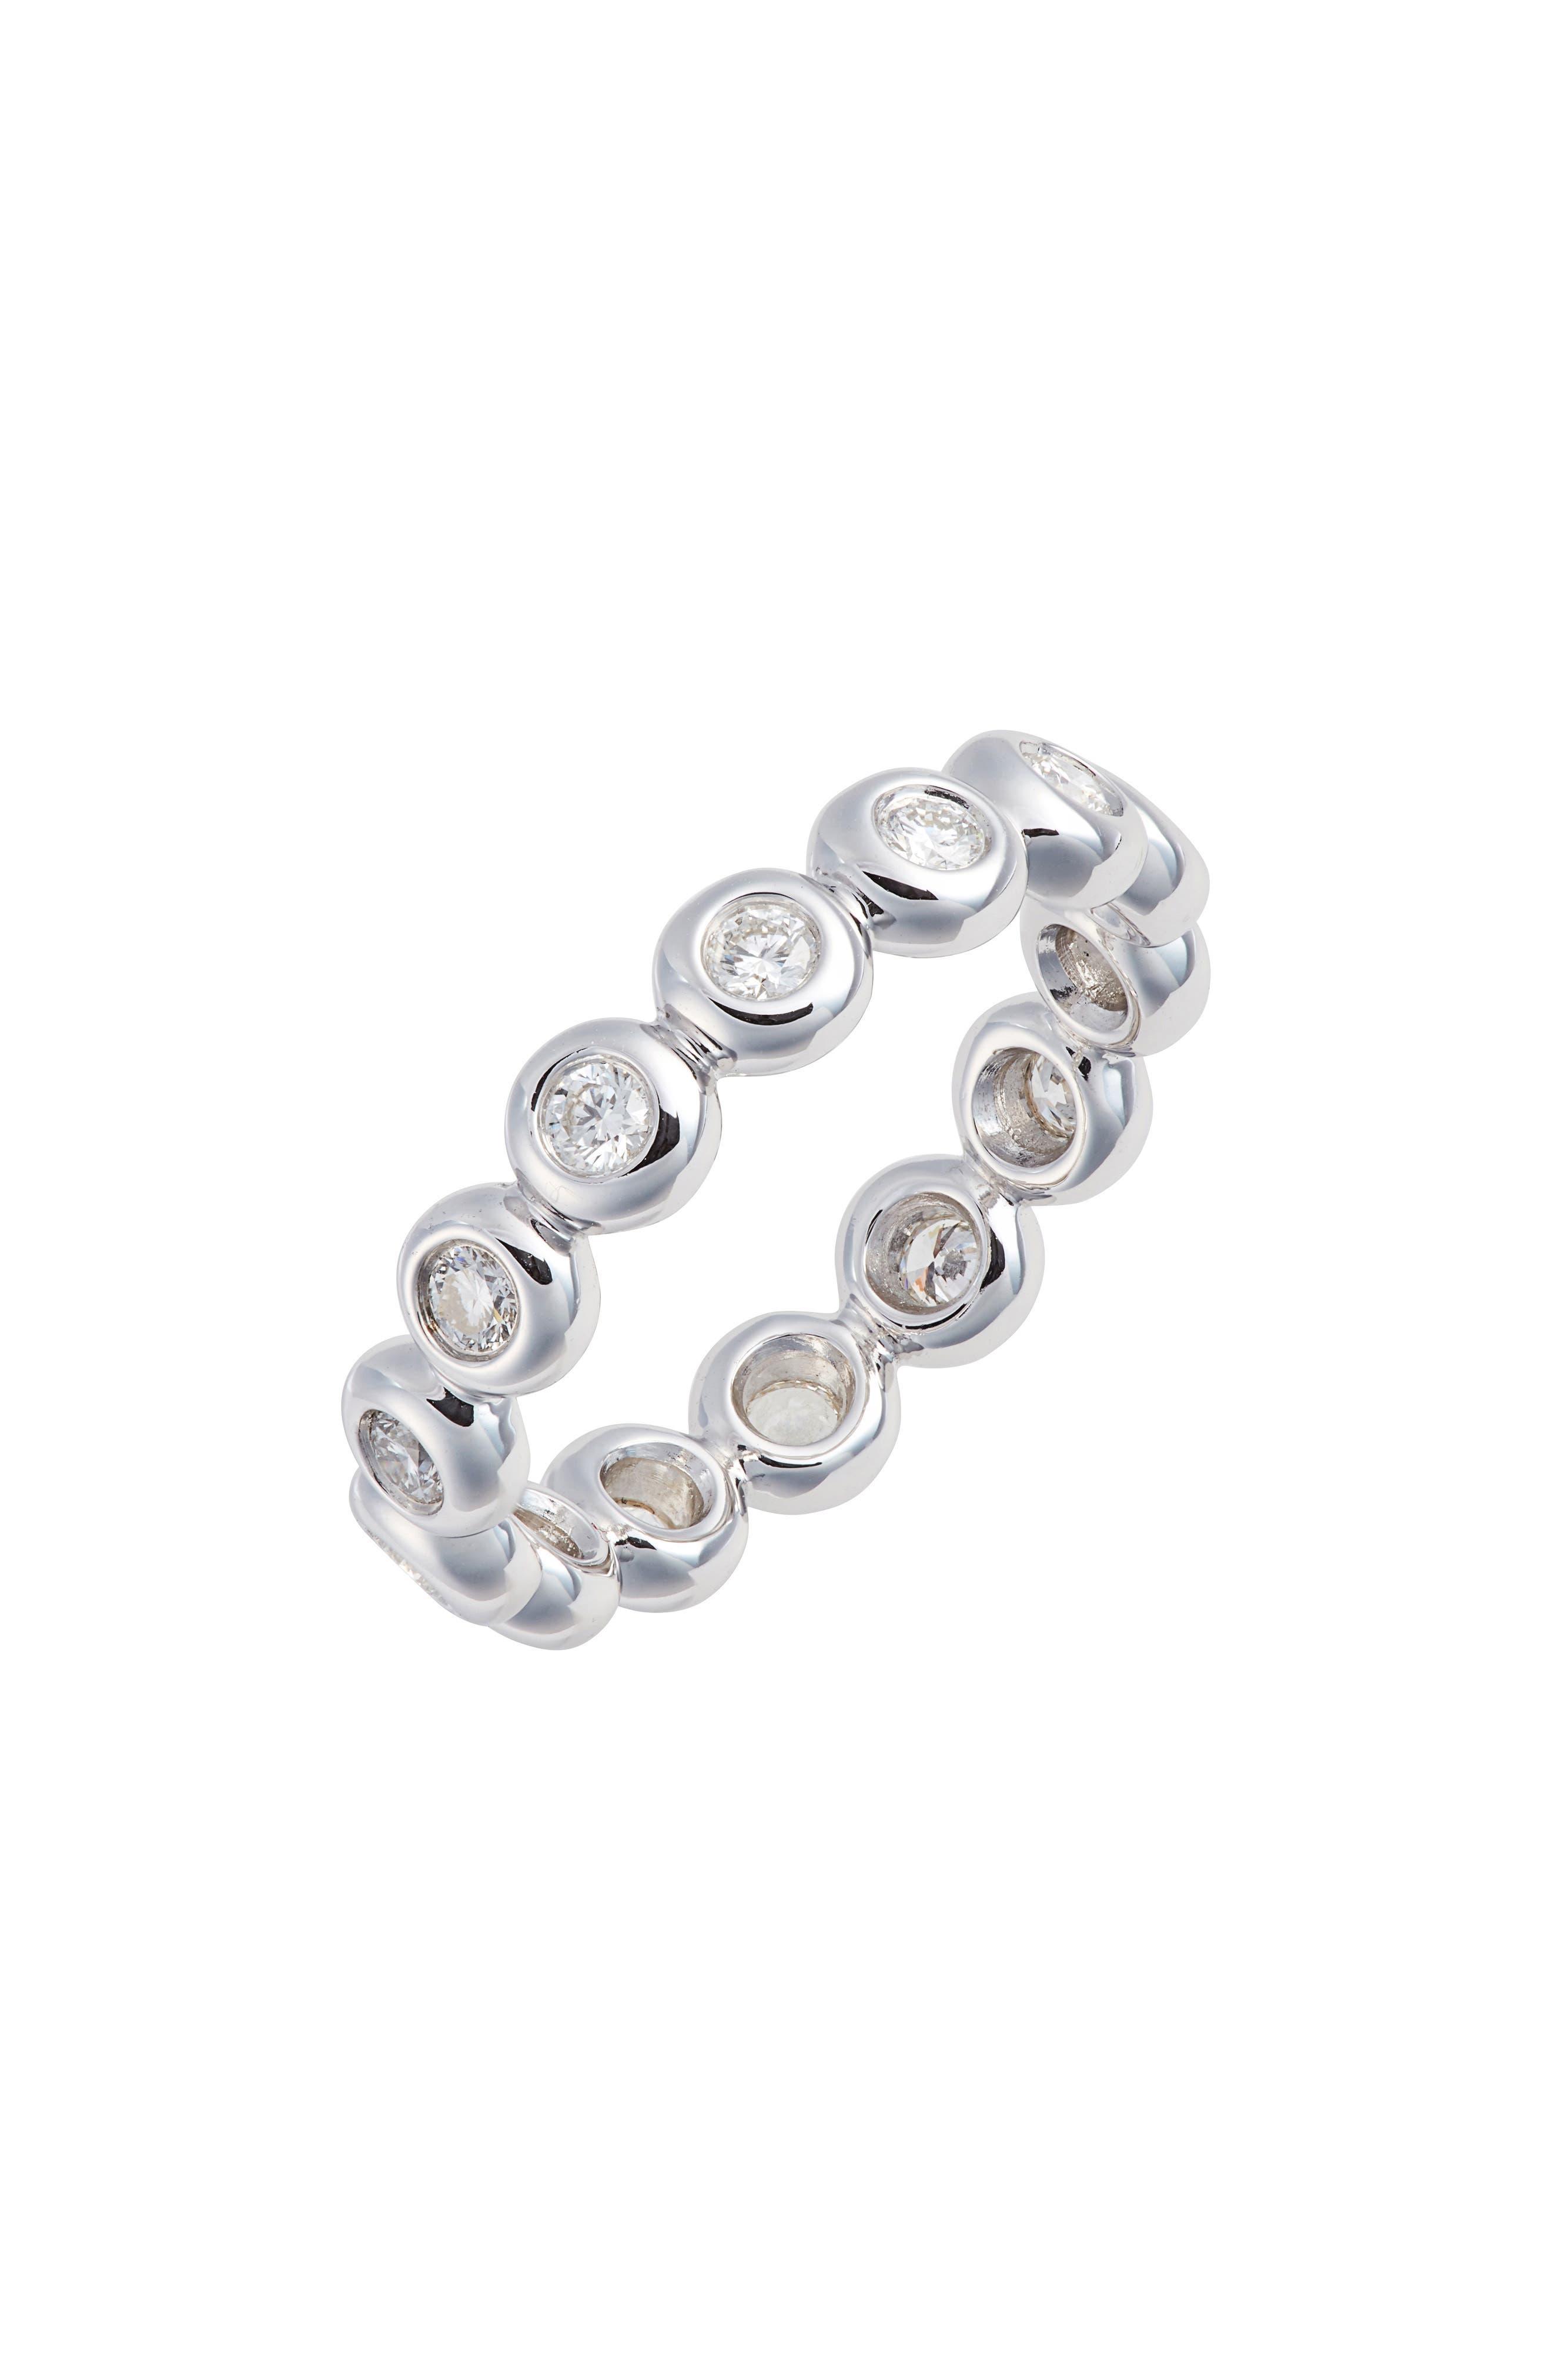 Monaco Bezel Diamond Stacking Ring,                         Main,                         color, WHITE GOLD/ DIA